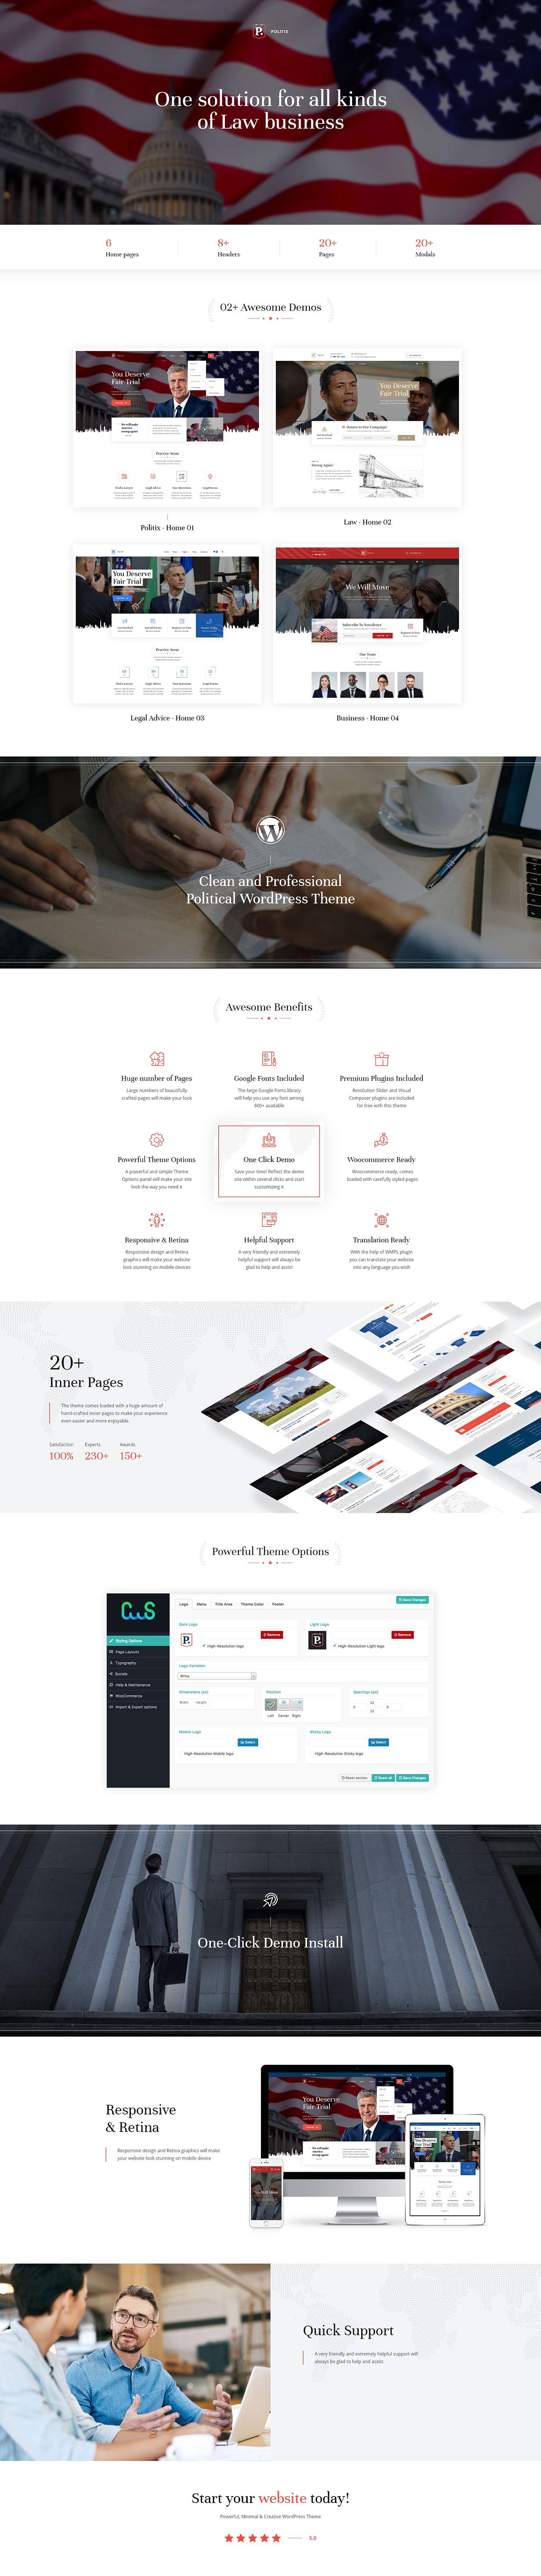 Politix - Political Campaign WordPress Theme